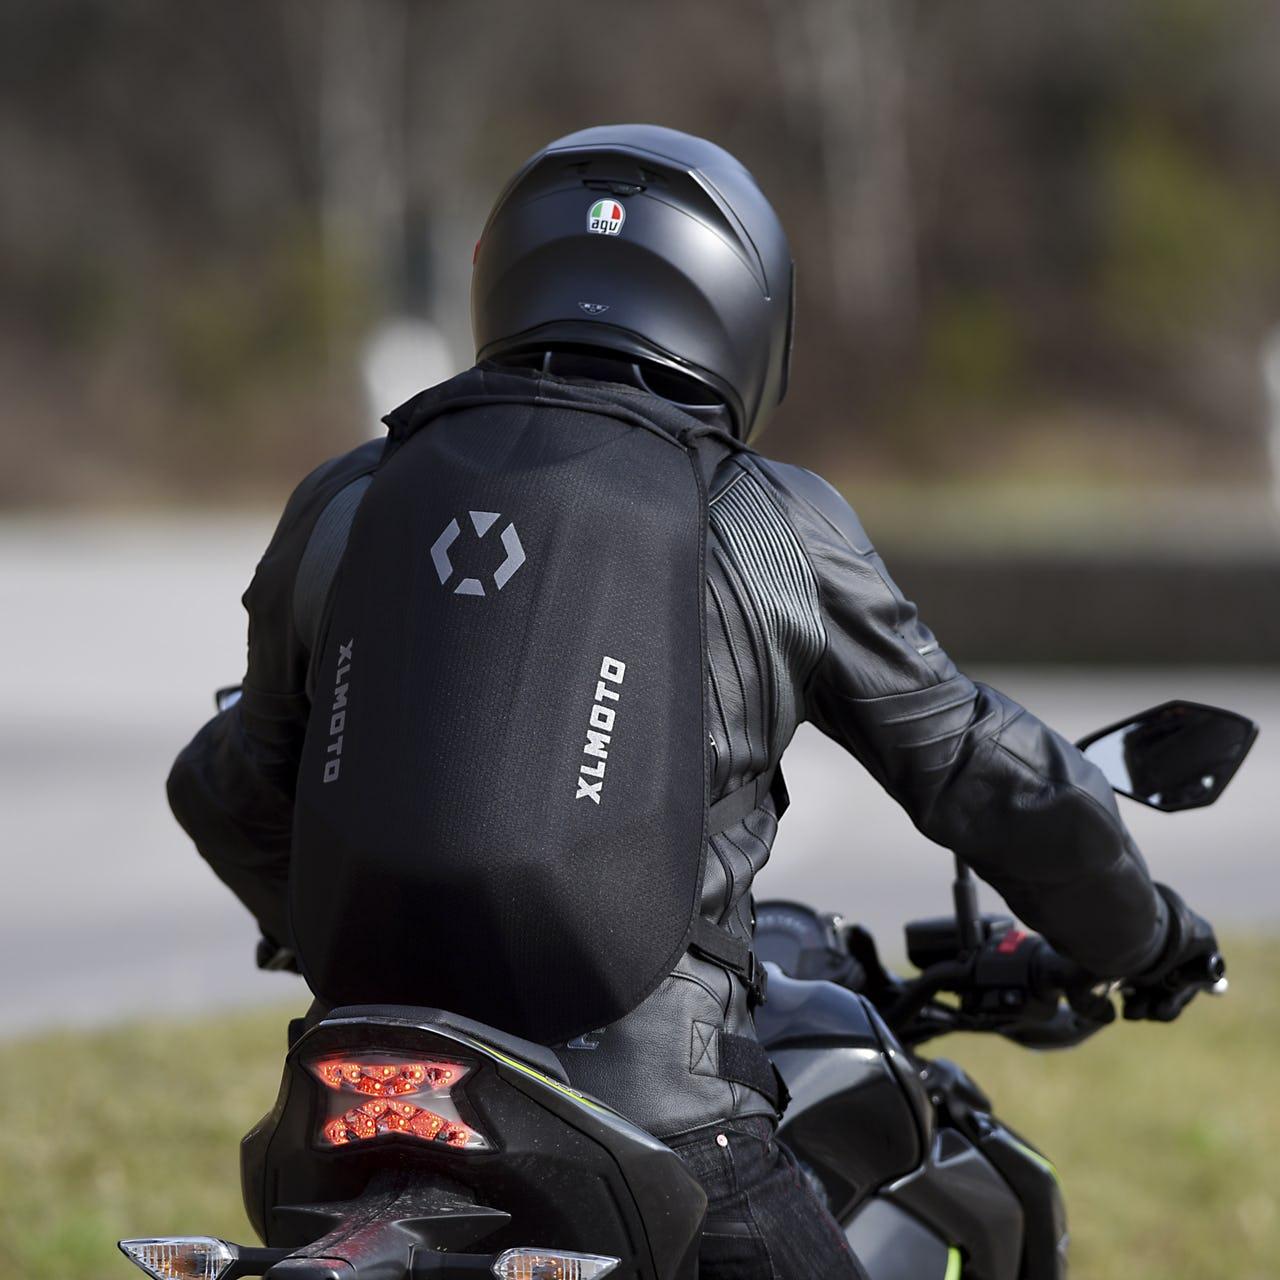 Mochila de Moto XLmoto Slipstream Resistente al Agua